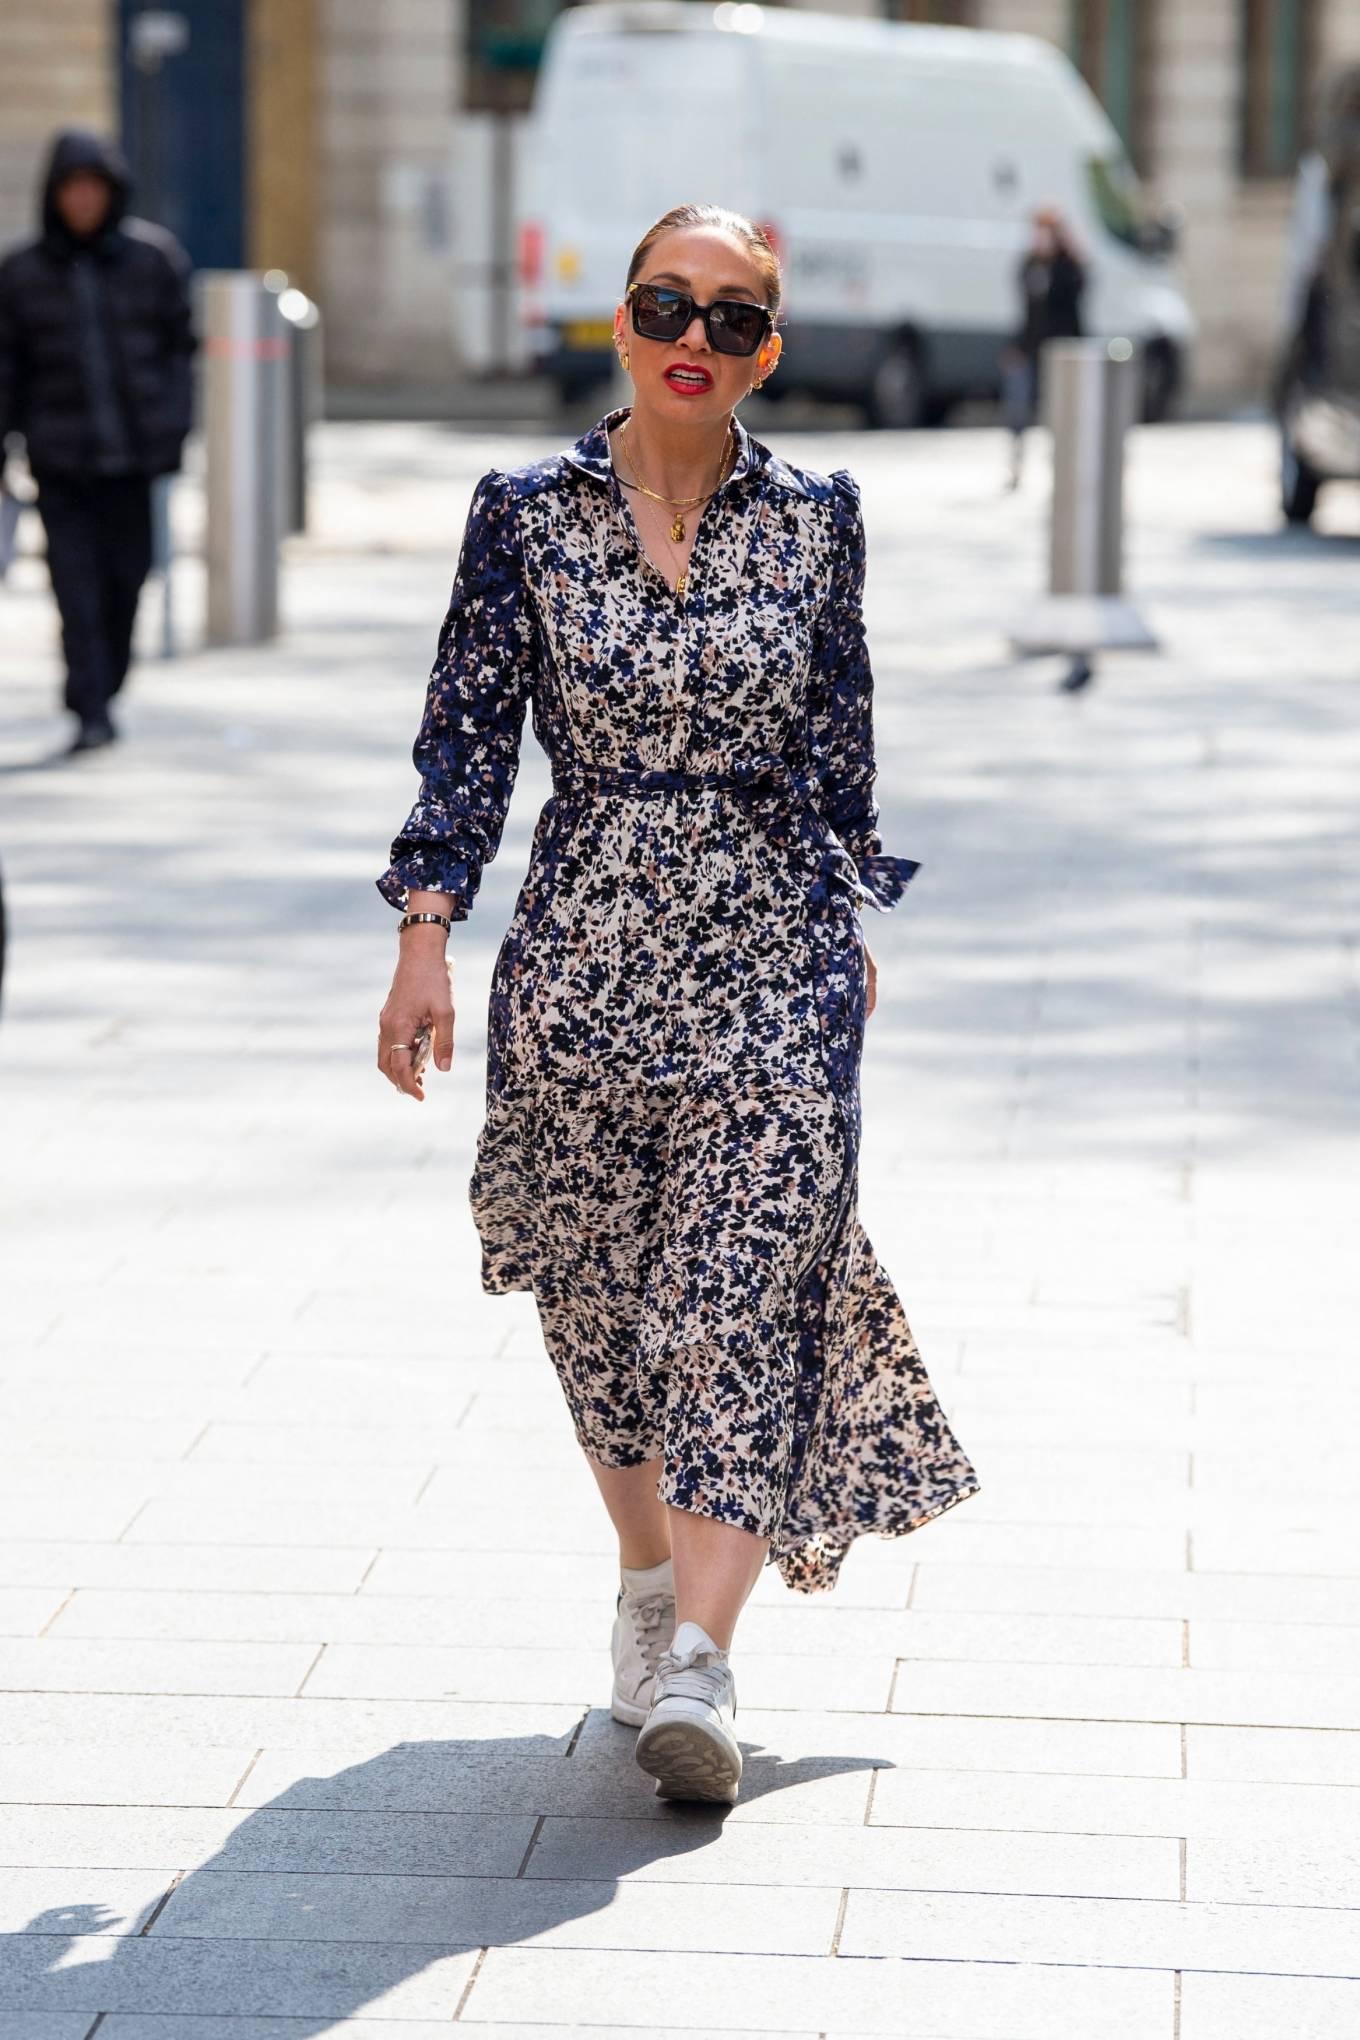 Myleene Klass 2021 : Myleene Klass – In a long summer dress arriving at the Global studios -05